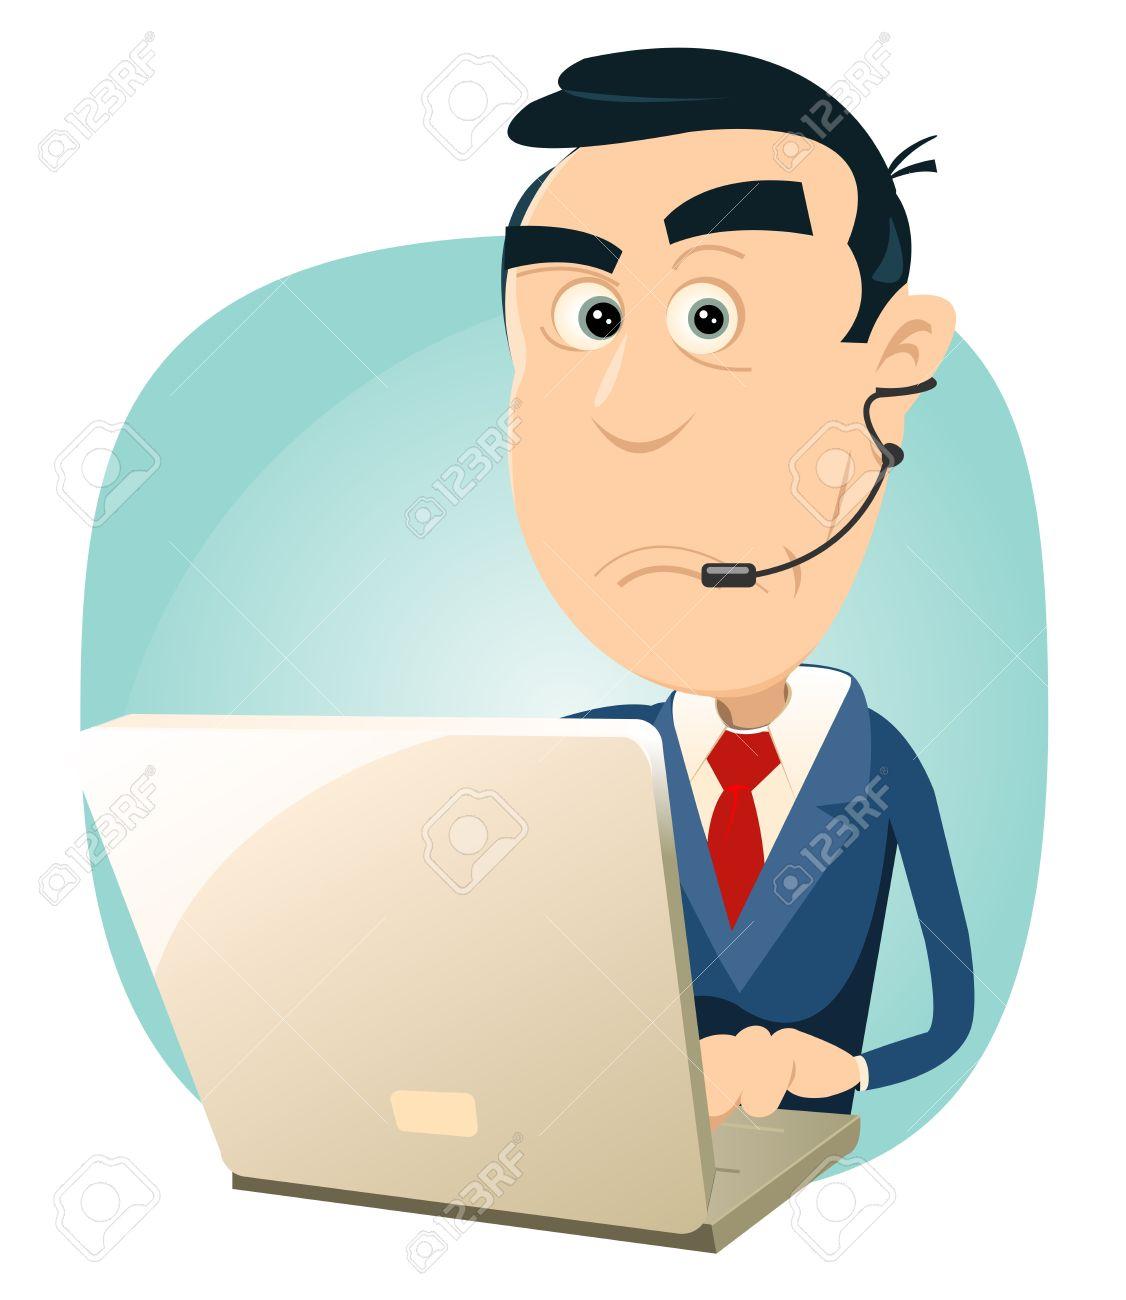 Illustration of a cartoon surprised man IT support Stock Vector - 11248765